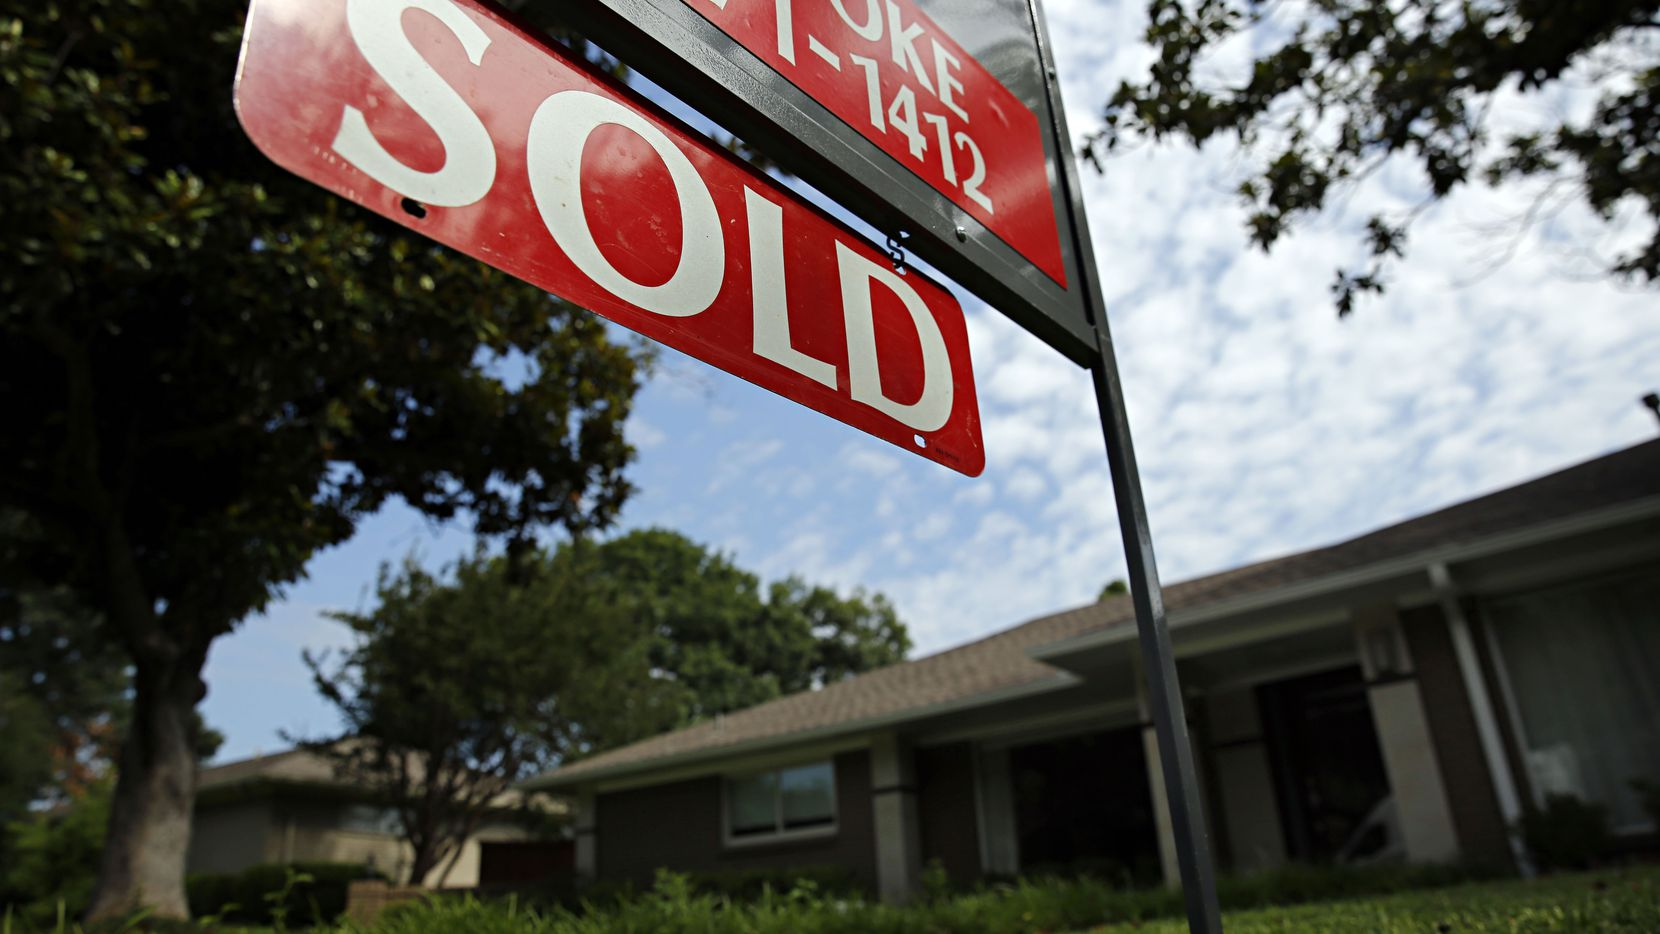 Austin and San Antonio had the biggest home price gains among major Texas markets.